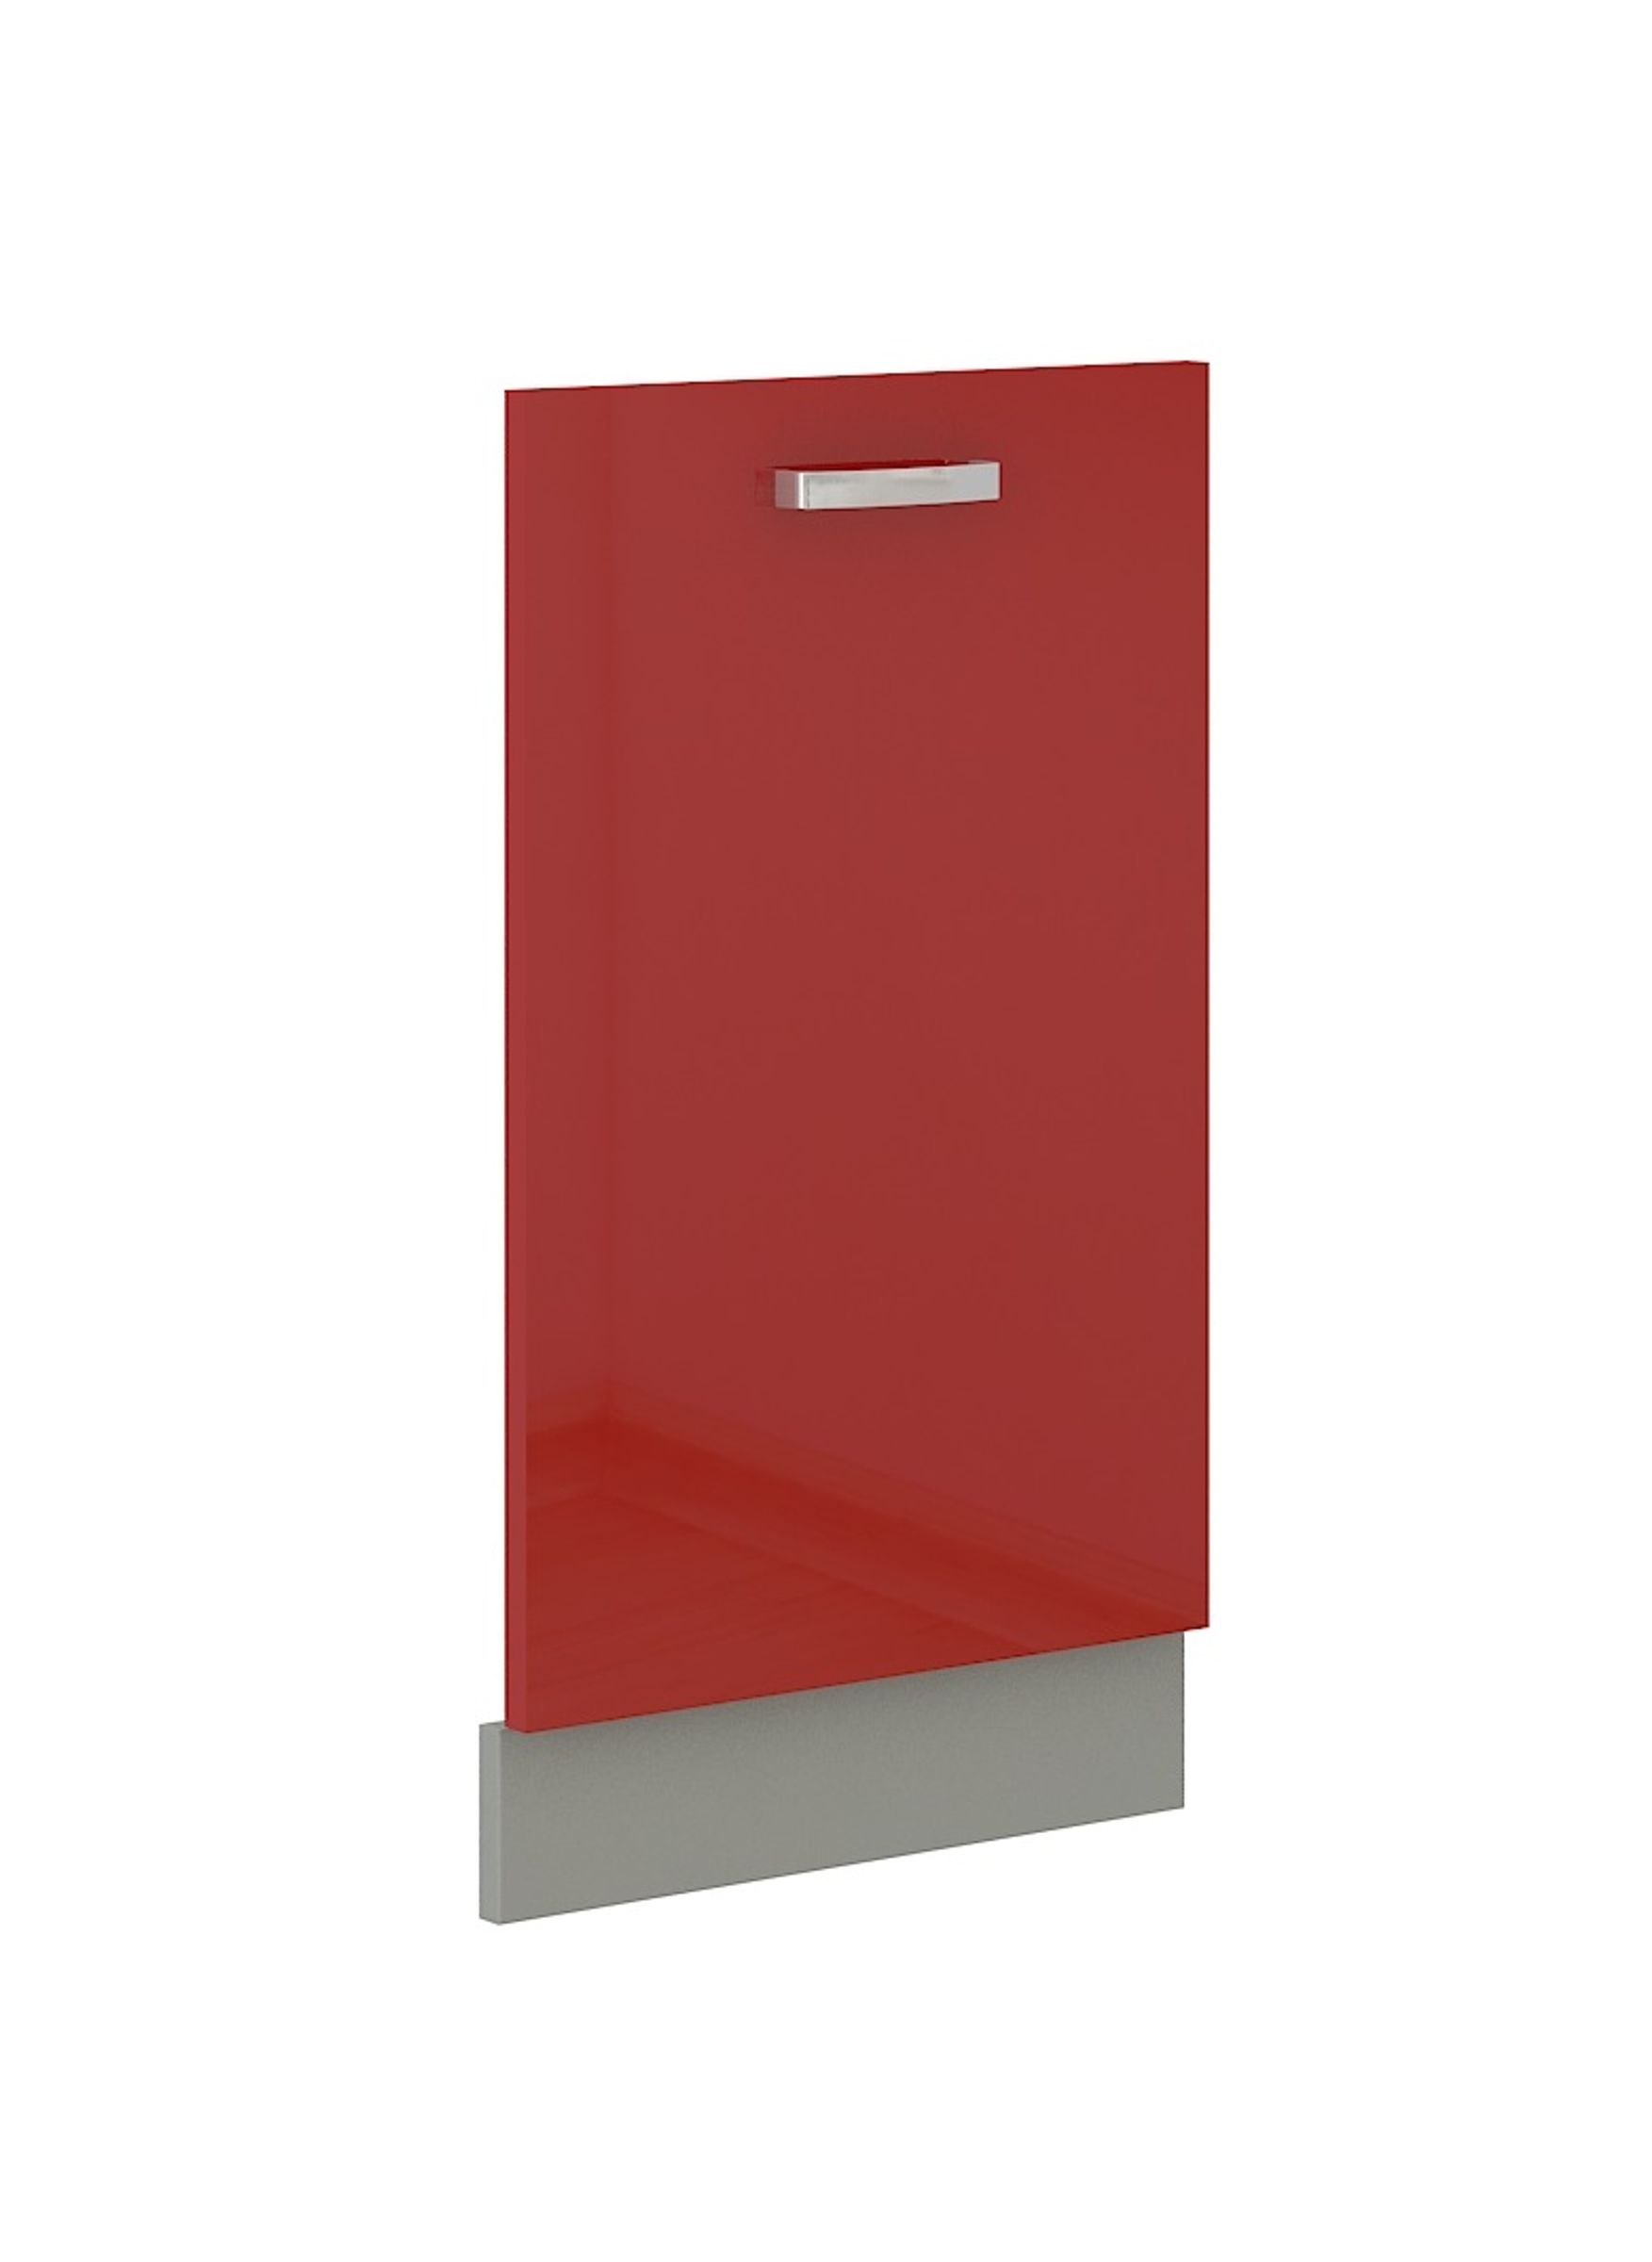 Frontblende für vollintegrierten Geschirrspüler 45 cm Rose Hochglanz Rot – Bild 1